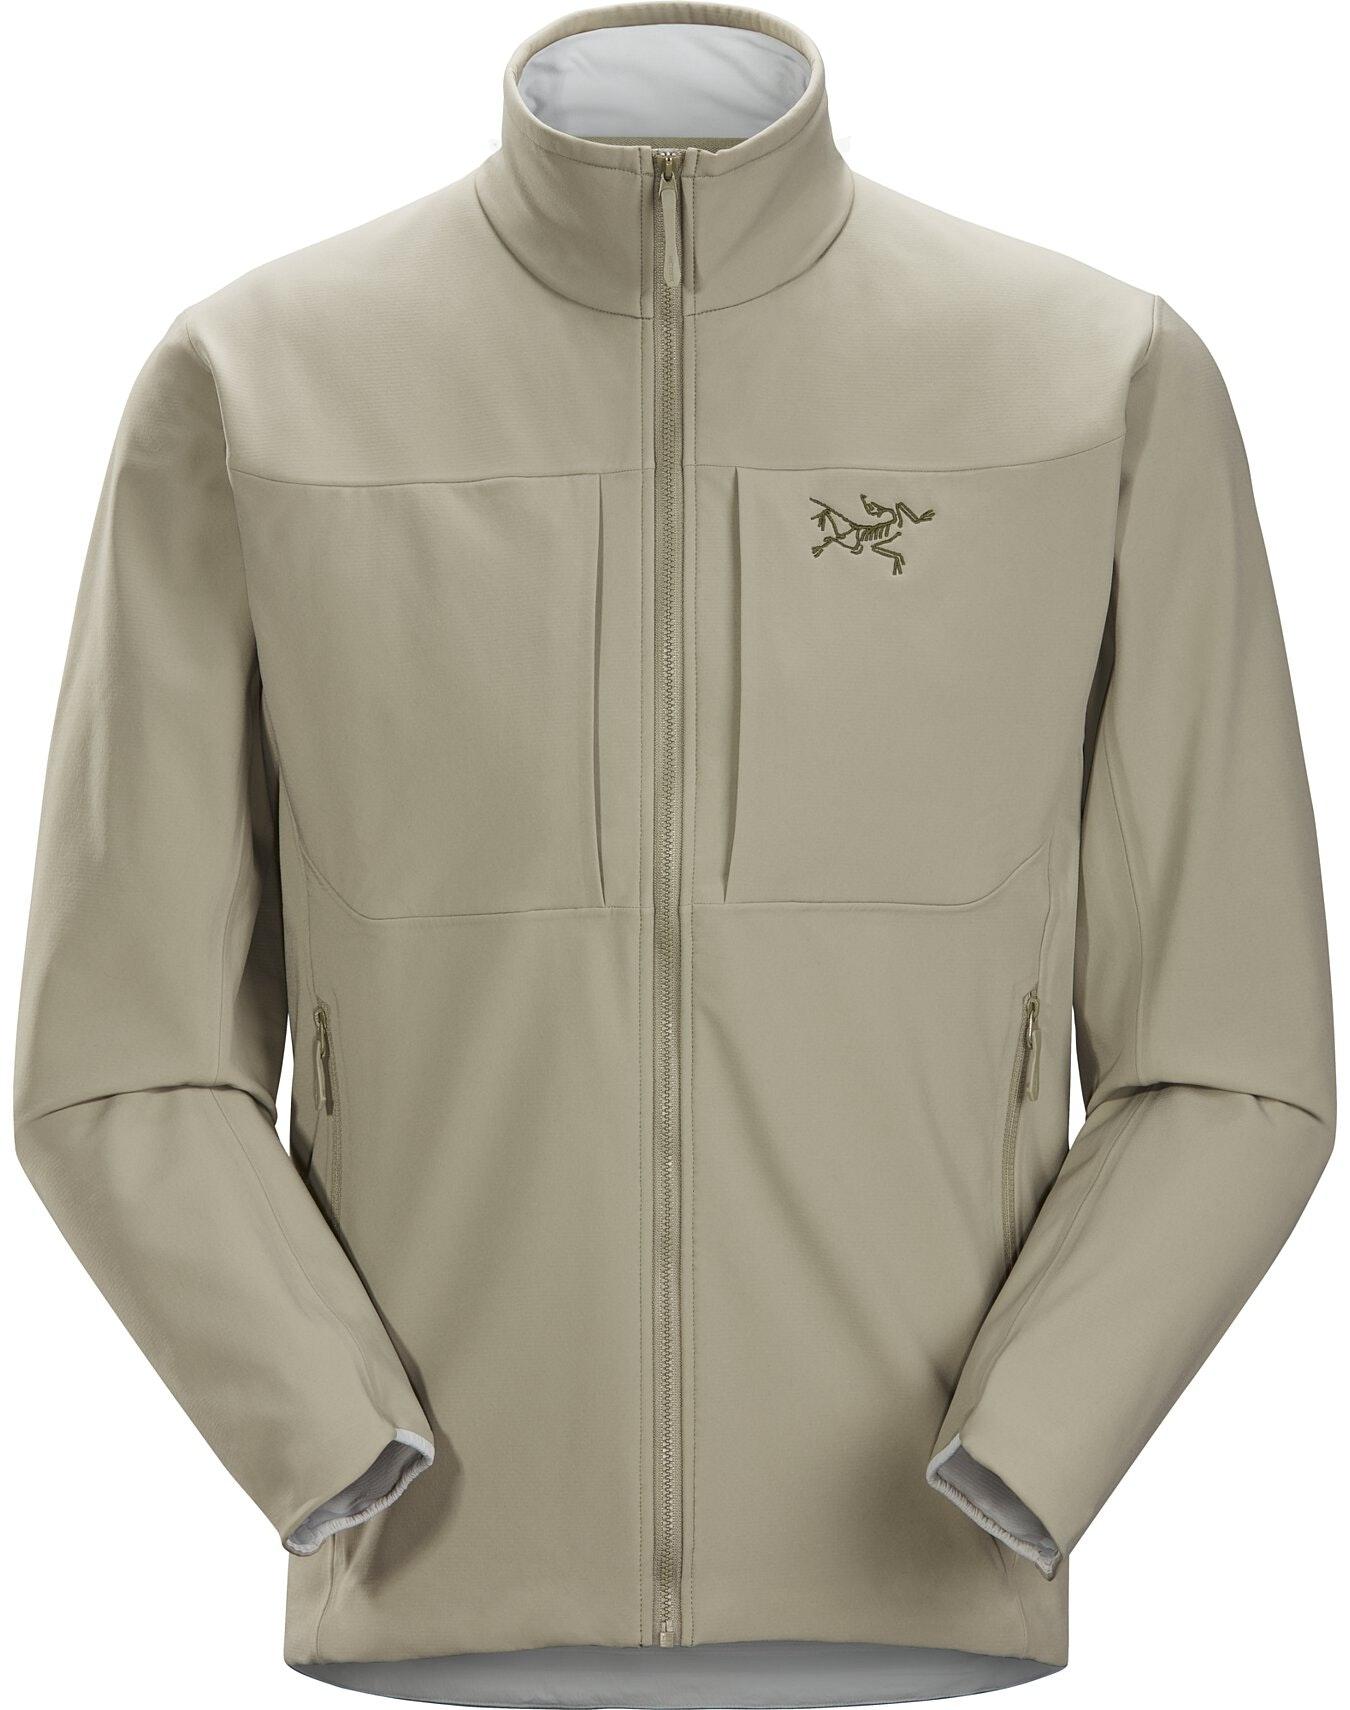 Gamma MX Jacket Distortion